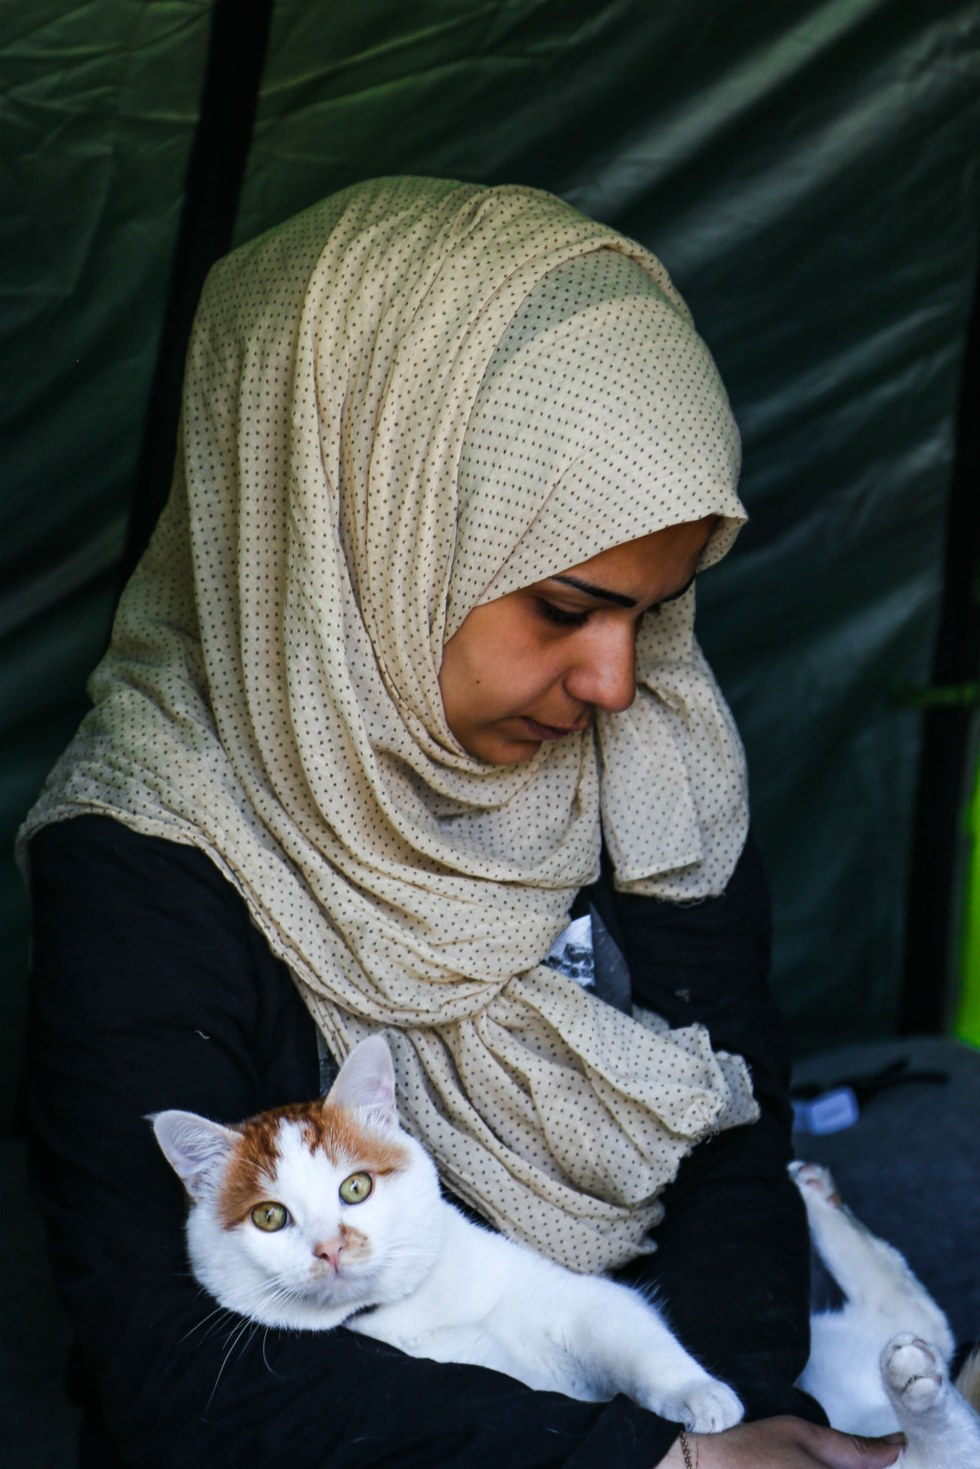 tabboush-chat-syrie-refugies-2